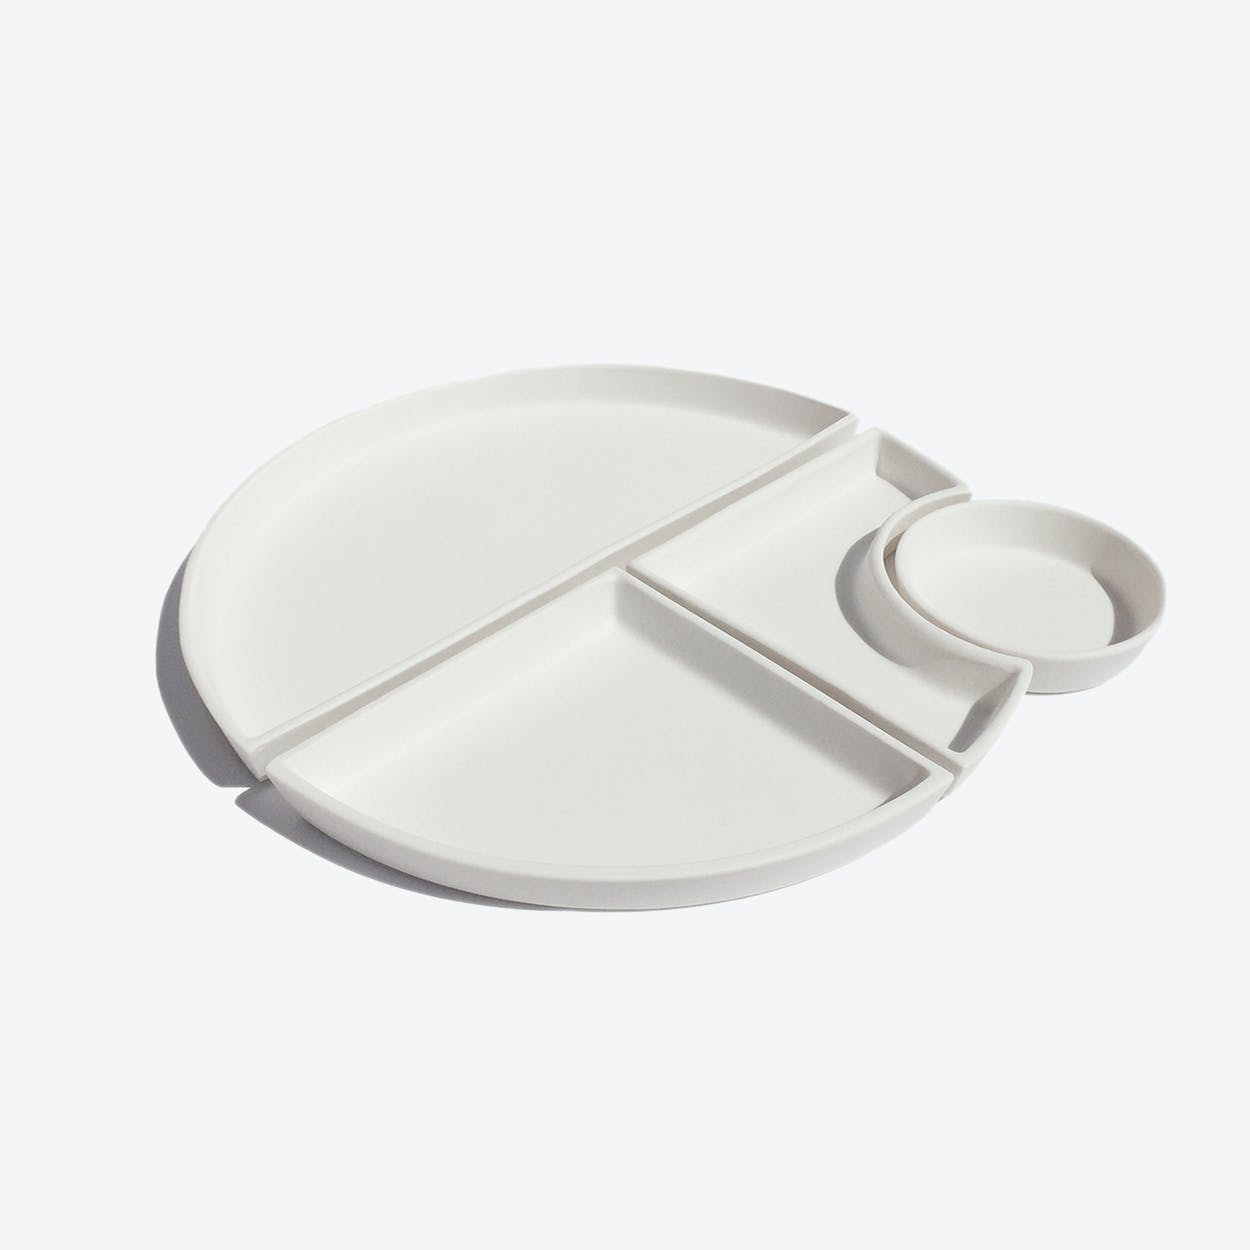 Porcelain Bento Set - Style 2